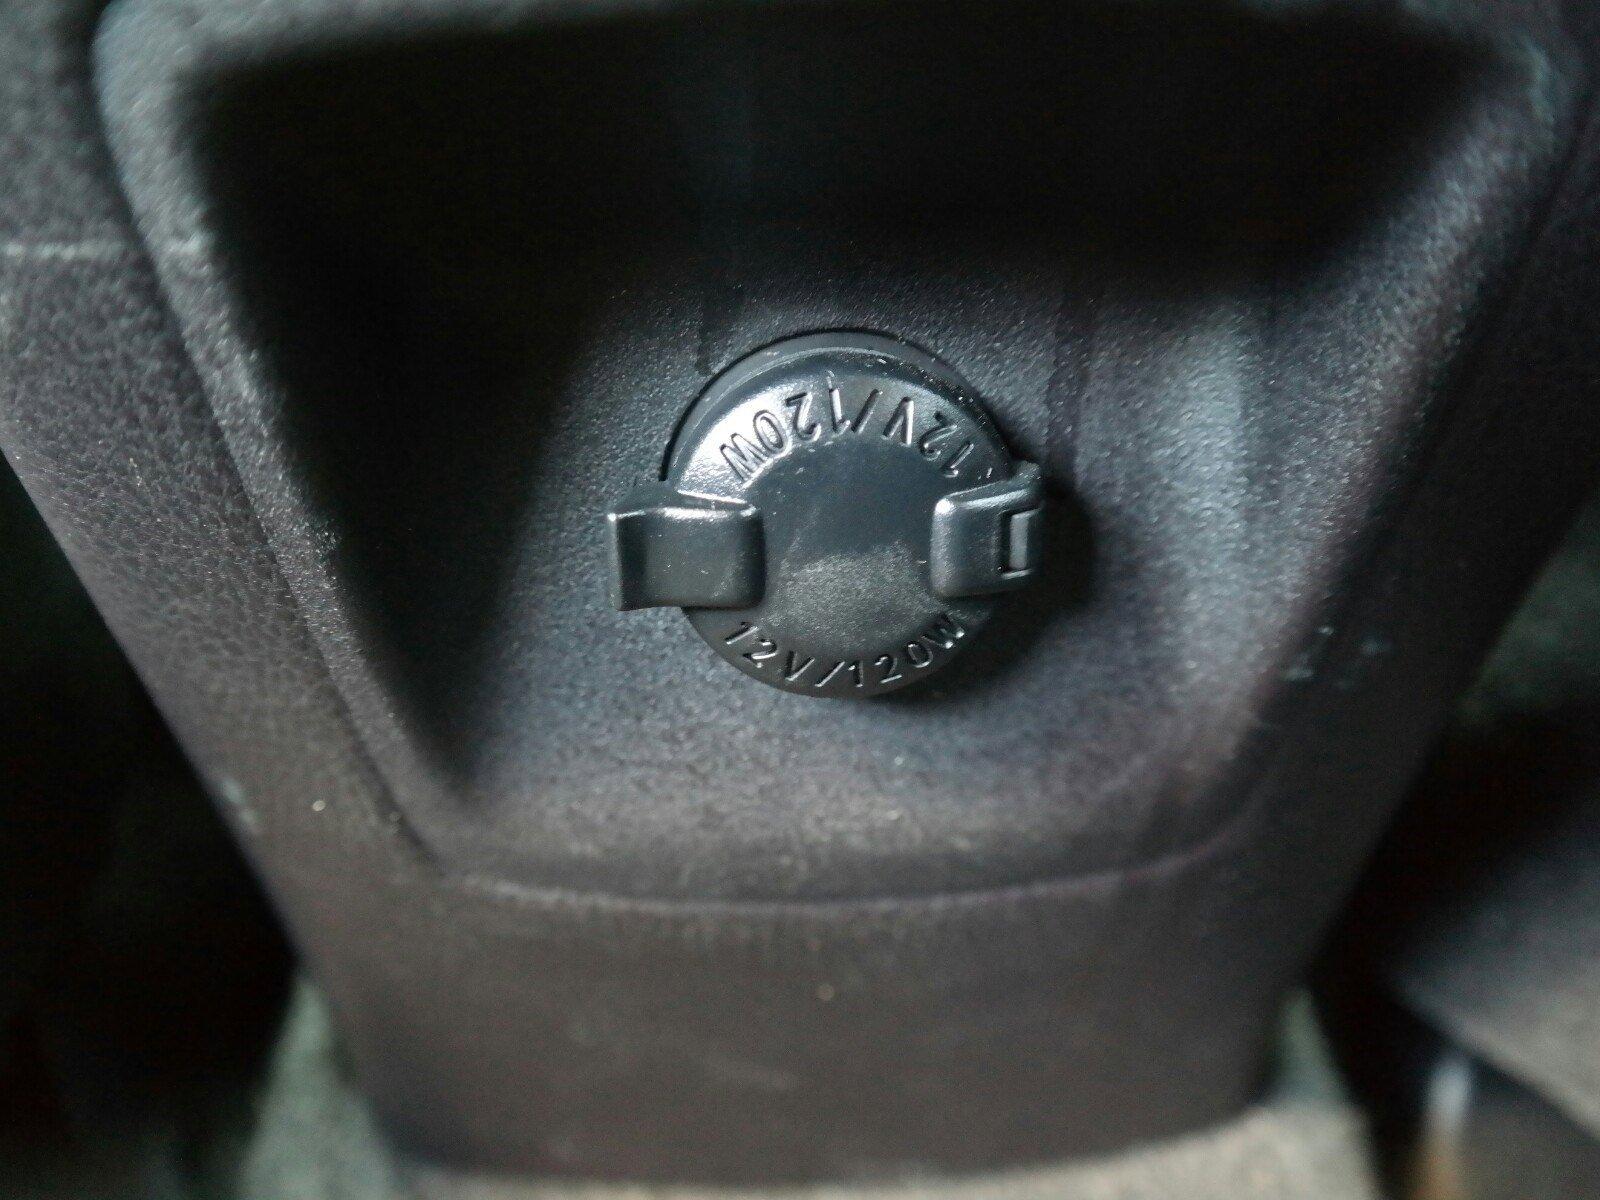 Pre-Owned 2016 Toyota RAV4 XLE